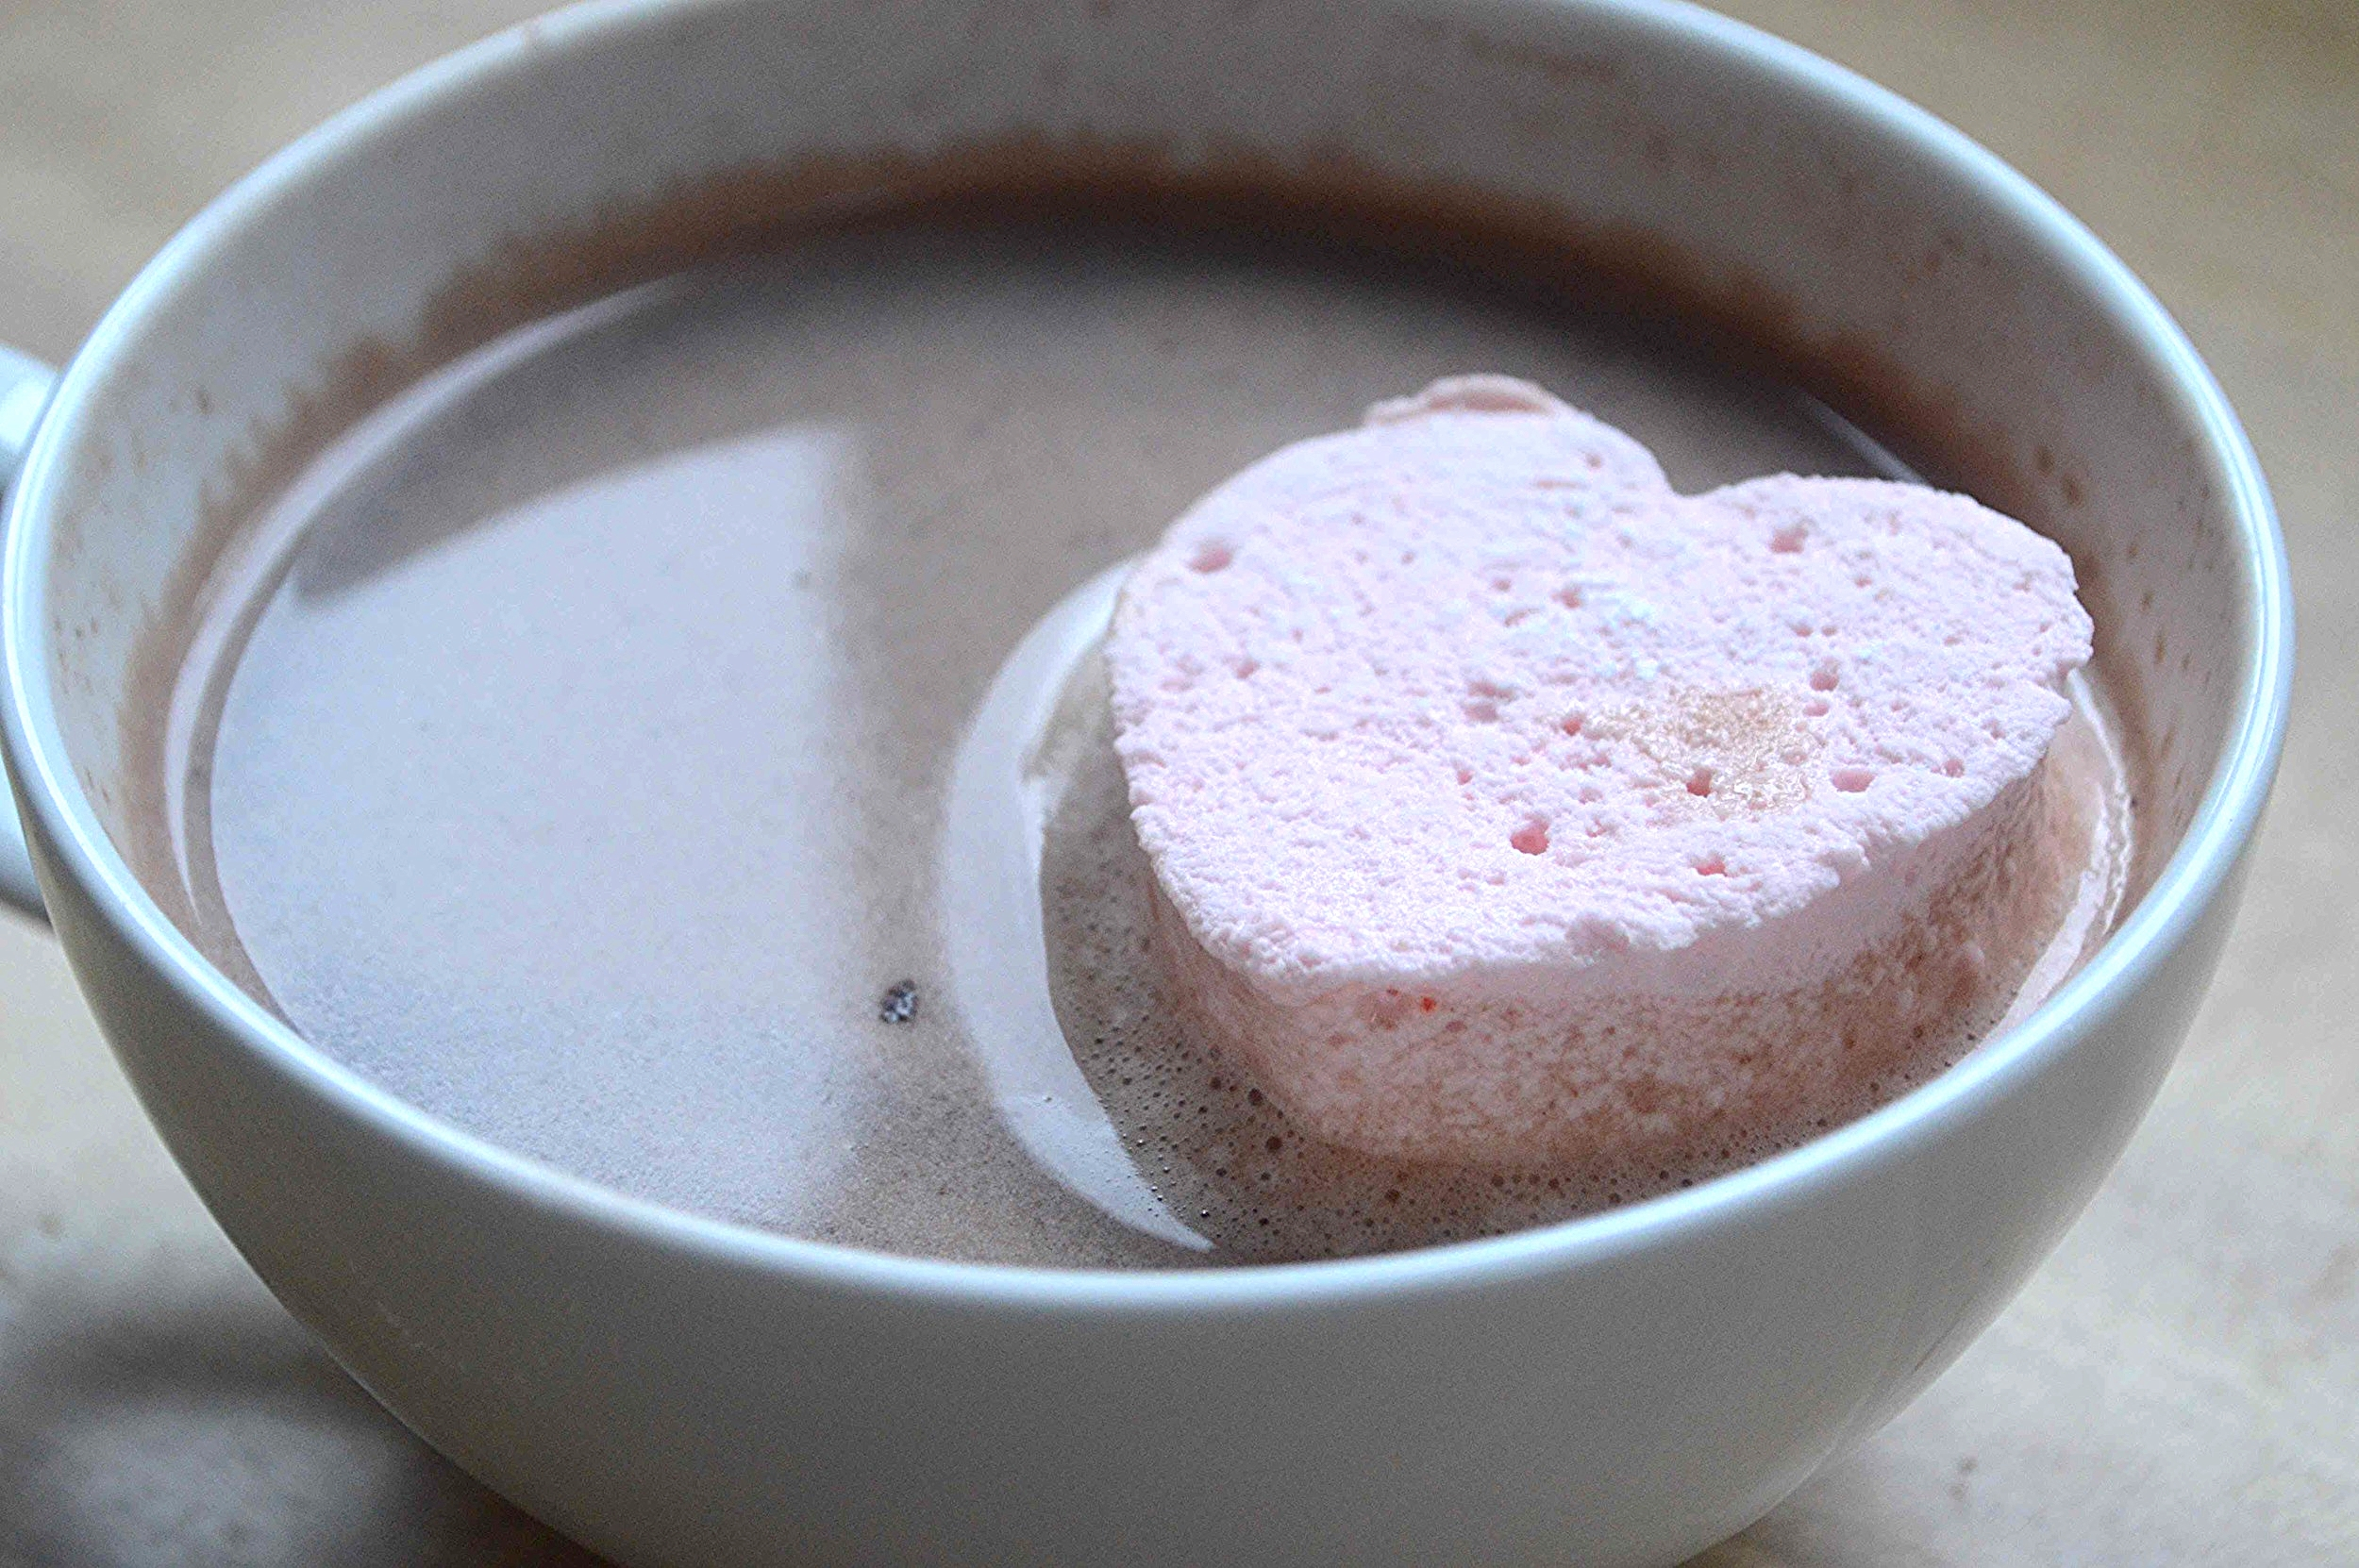 Butter Baked Goods' Famous Homemade Marshmallows